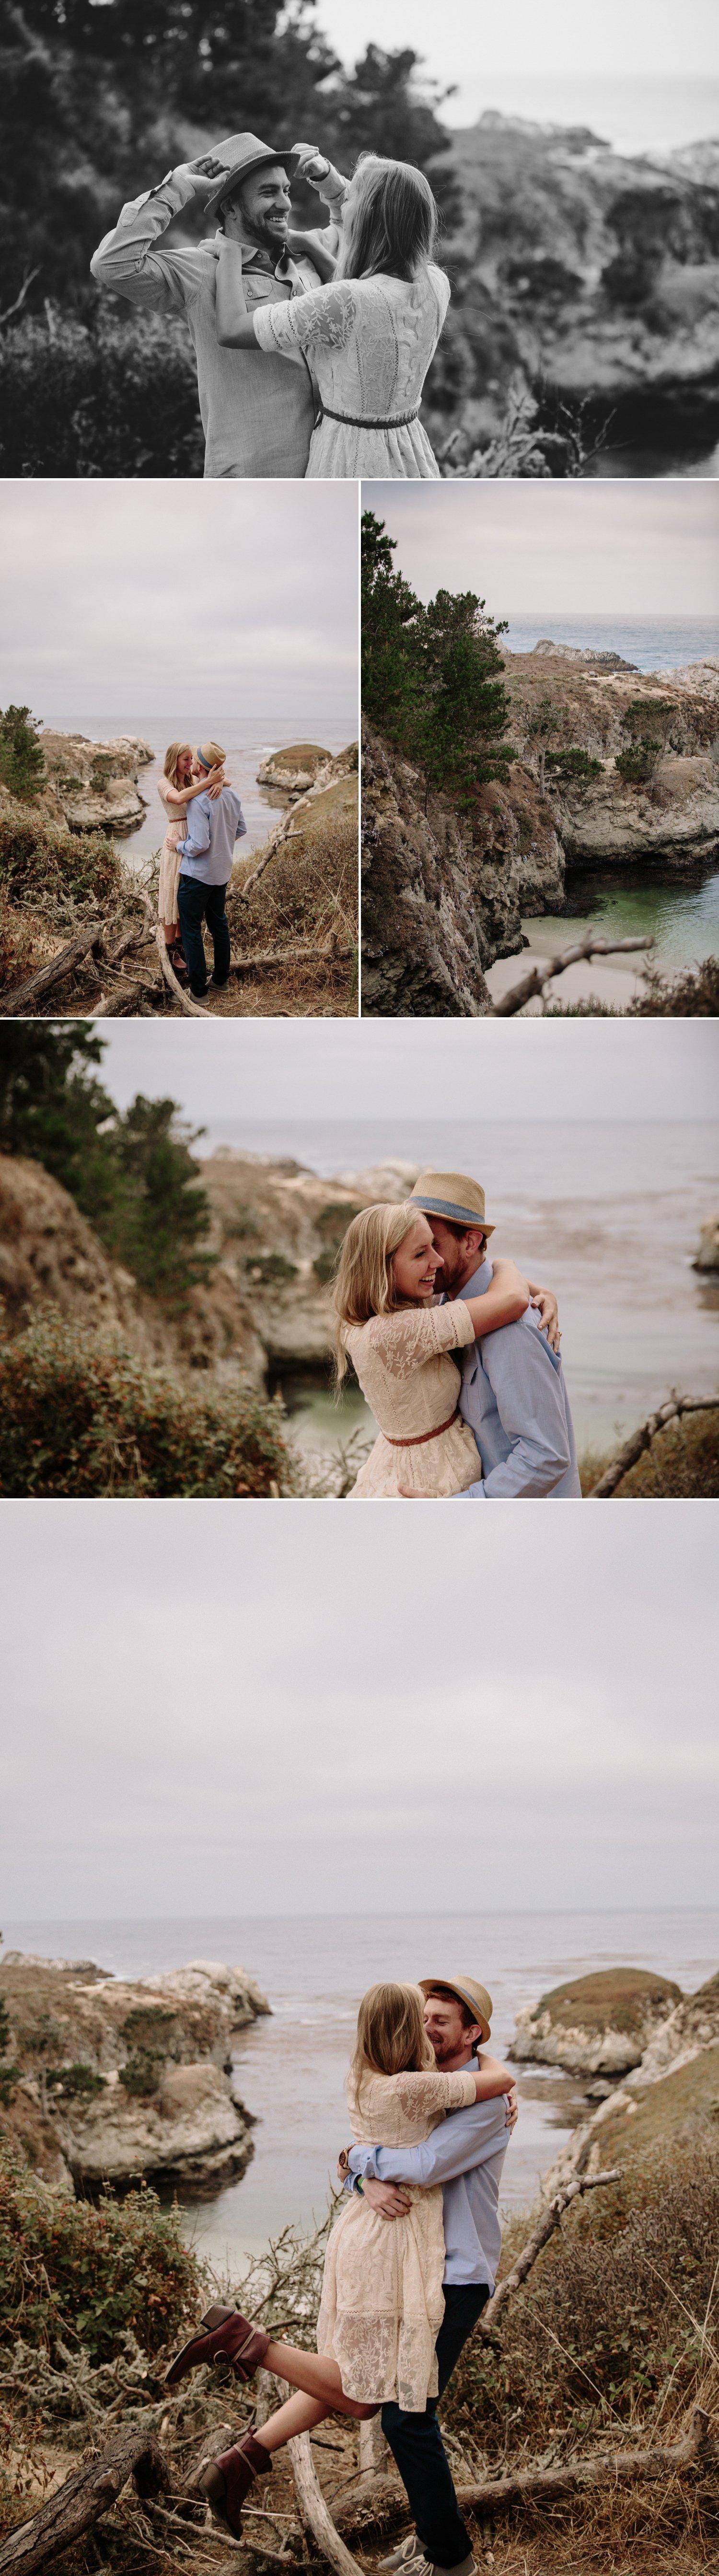 Carmel wedding photographer Paige Nelson